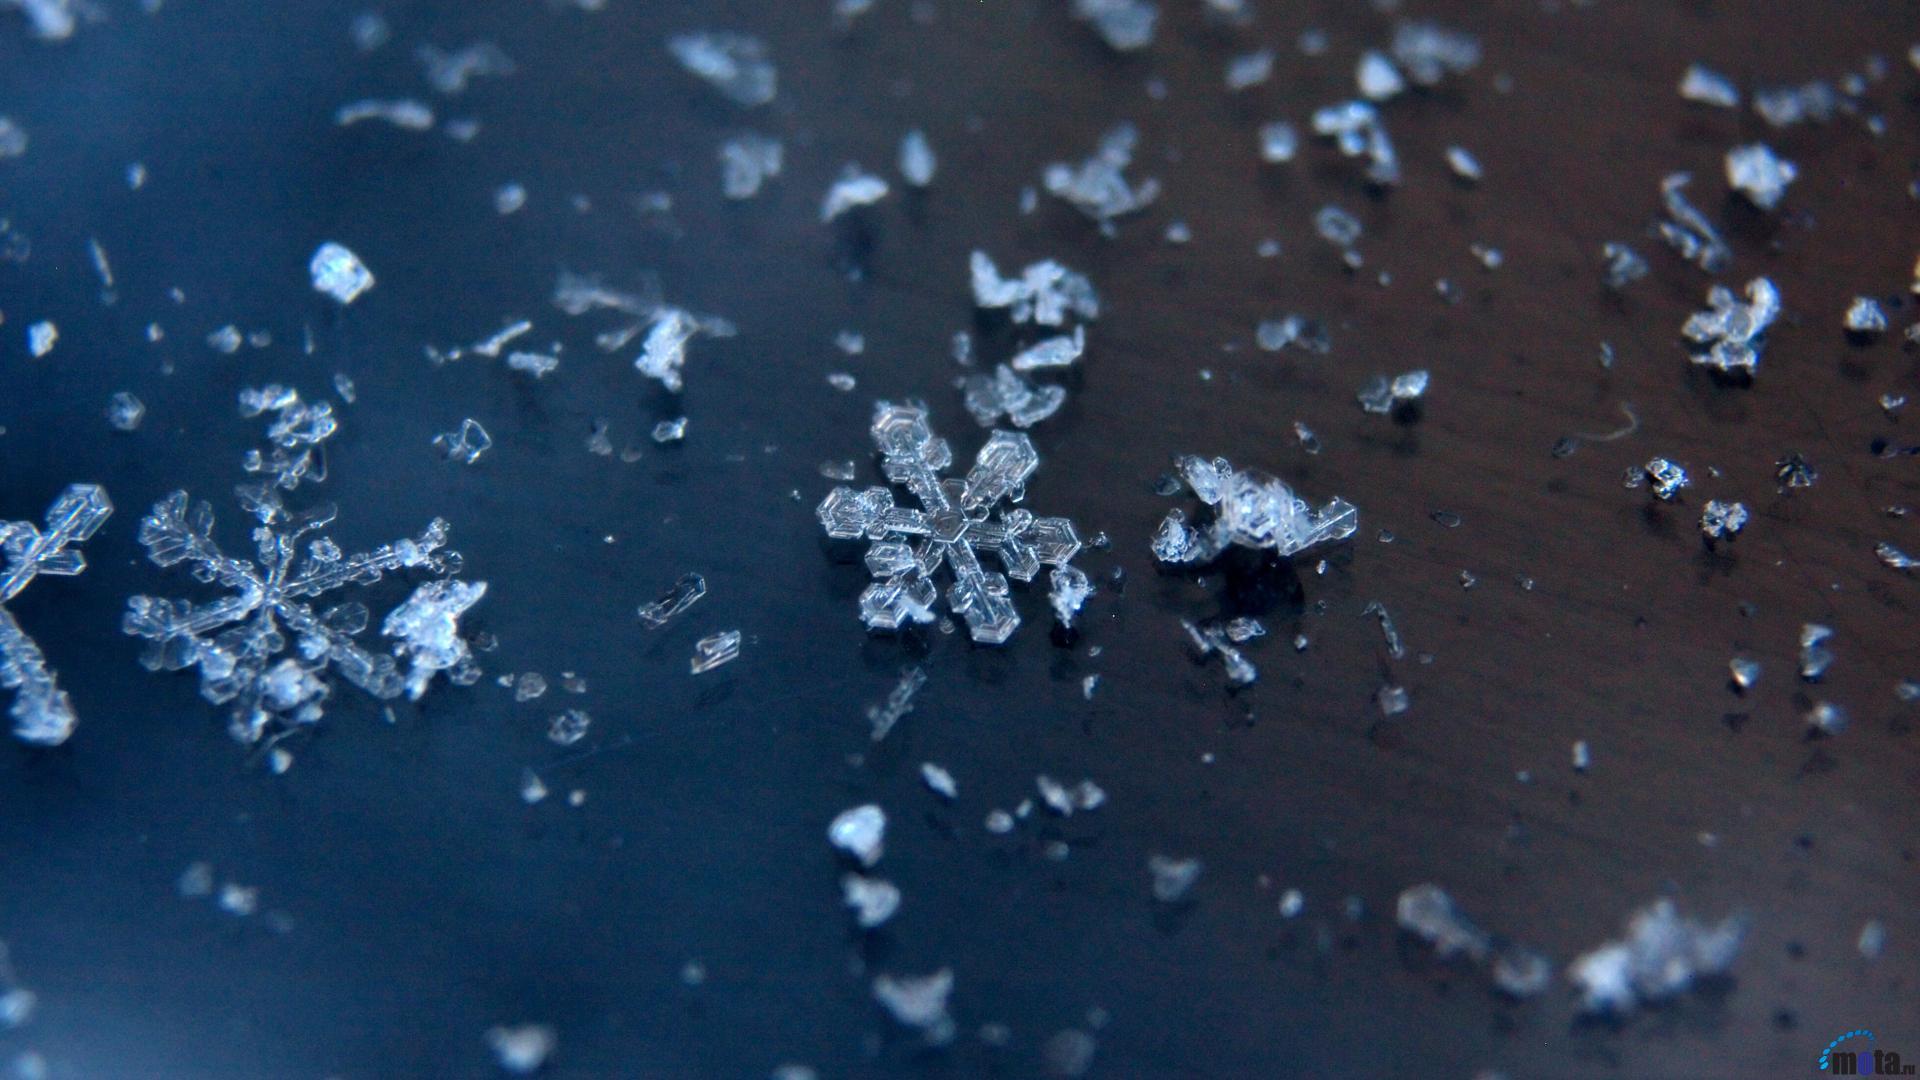 Wallpaper snowflakes